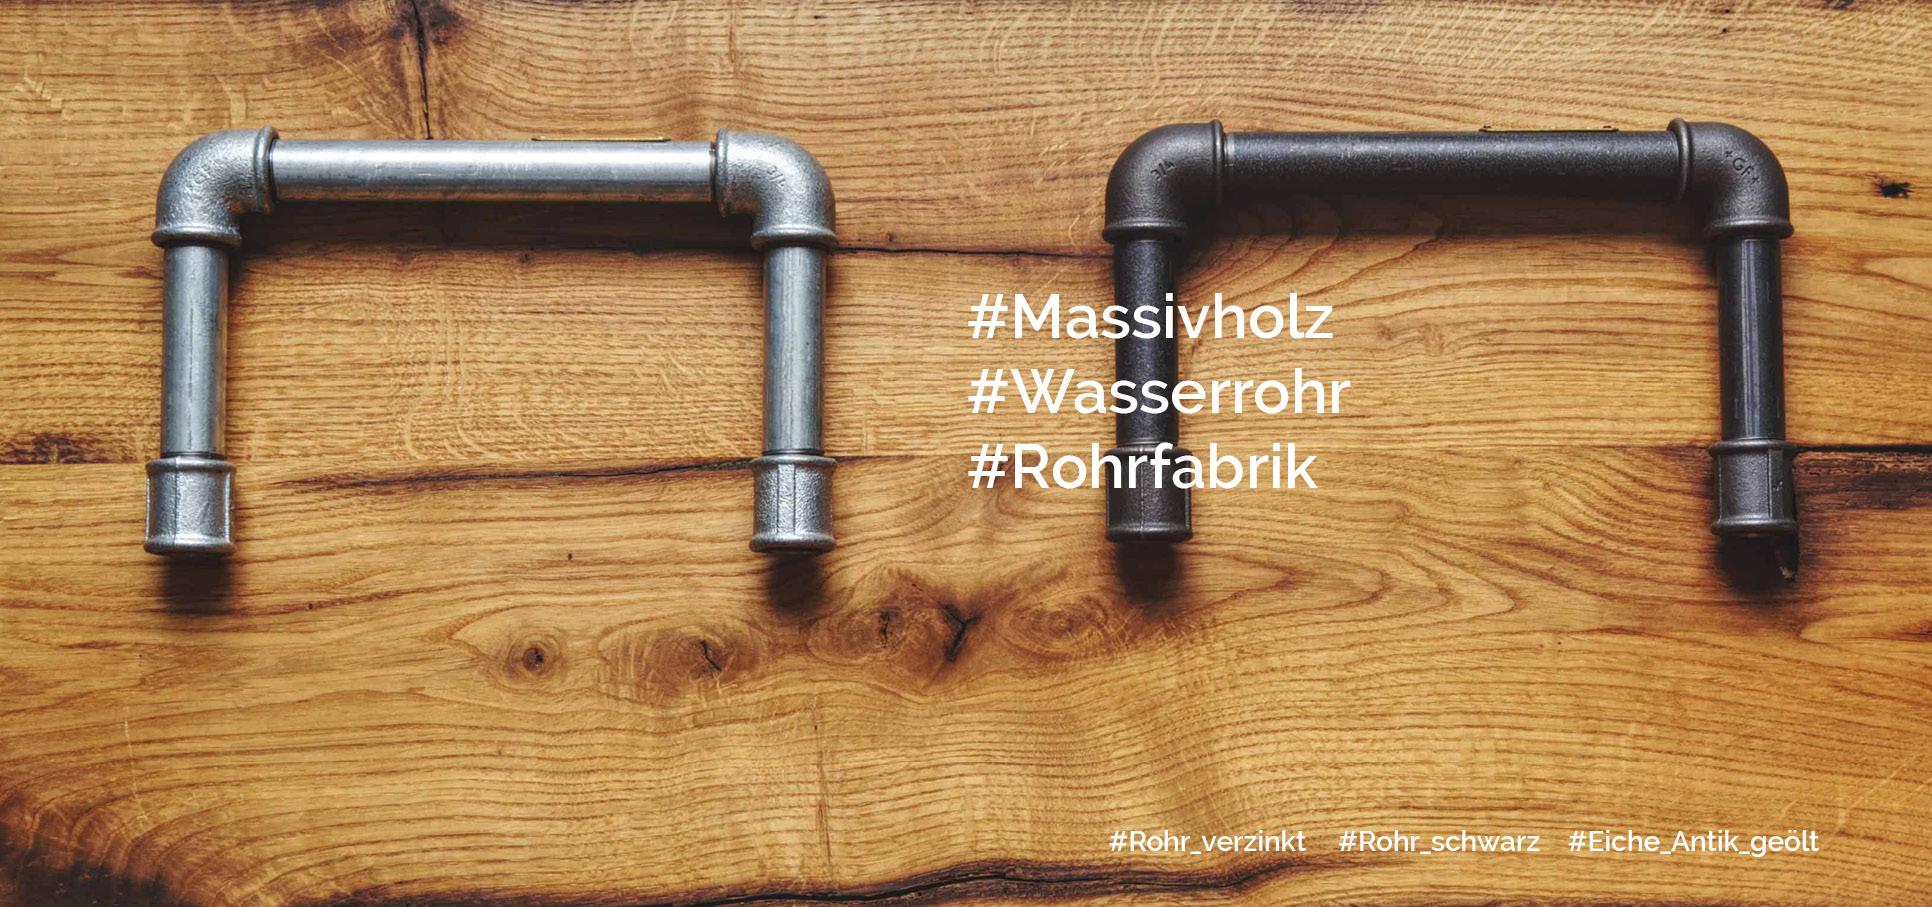 rohrfabrik-massivholz-tablar-eiche-alt-geoelt-antik-design-metall-wasserrohr-garderobe4.jpg